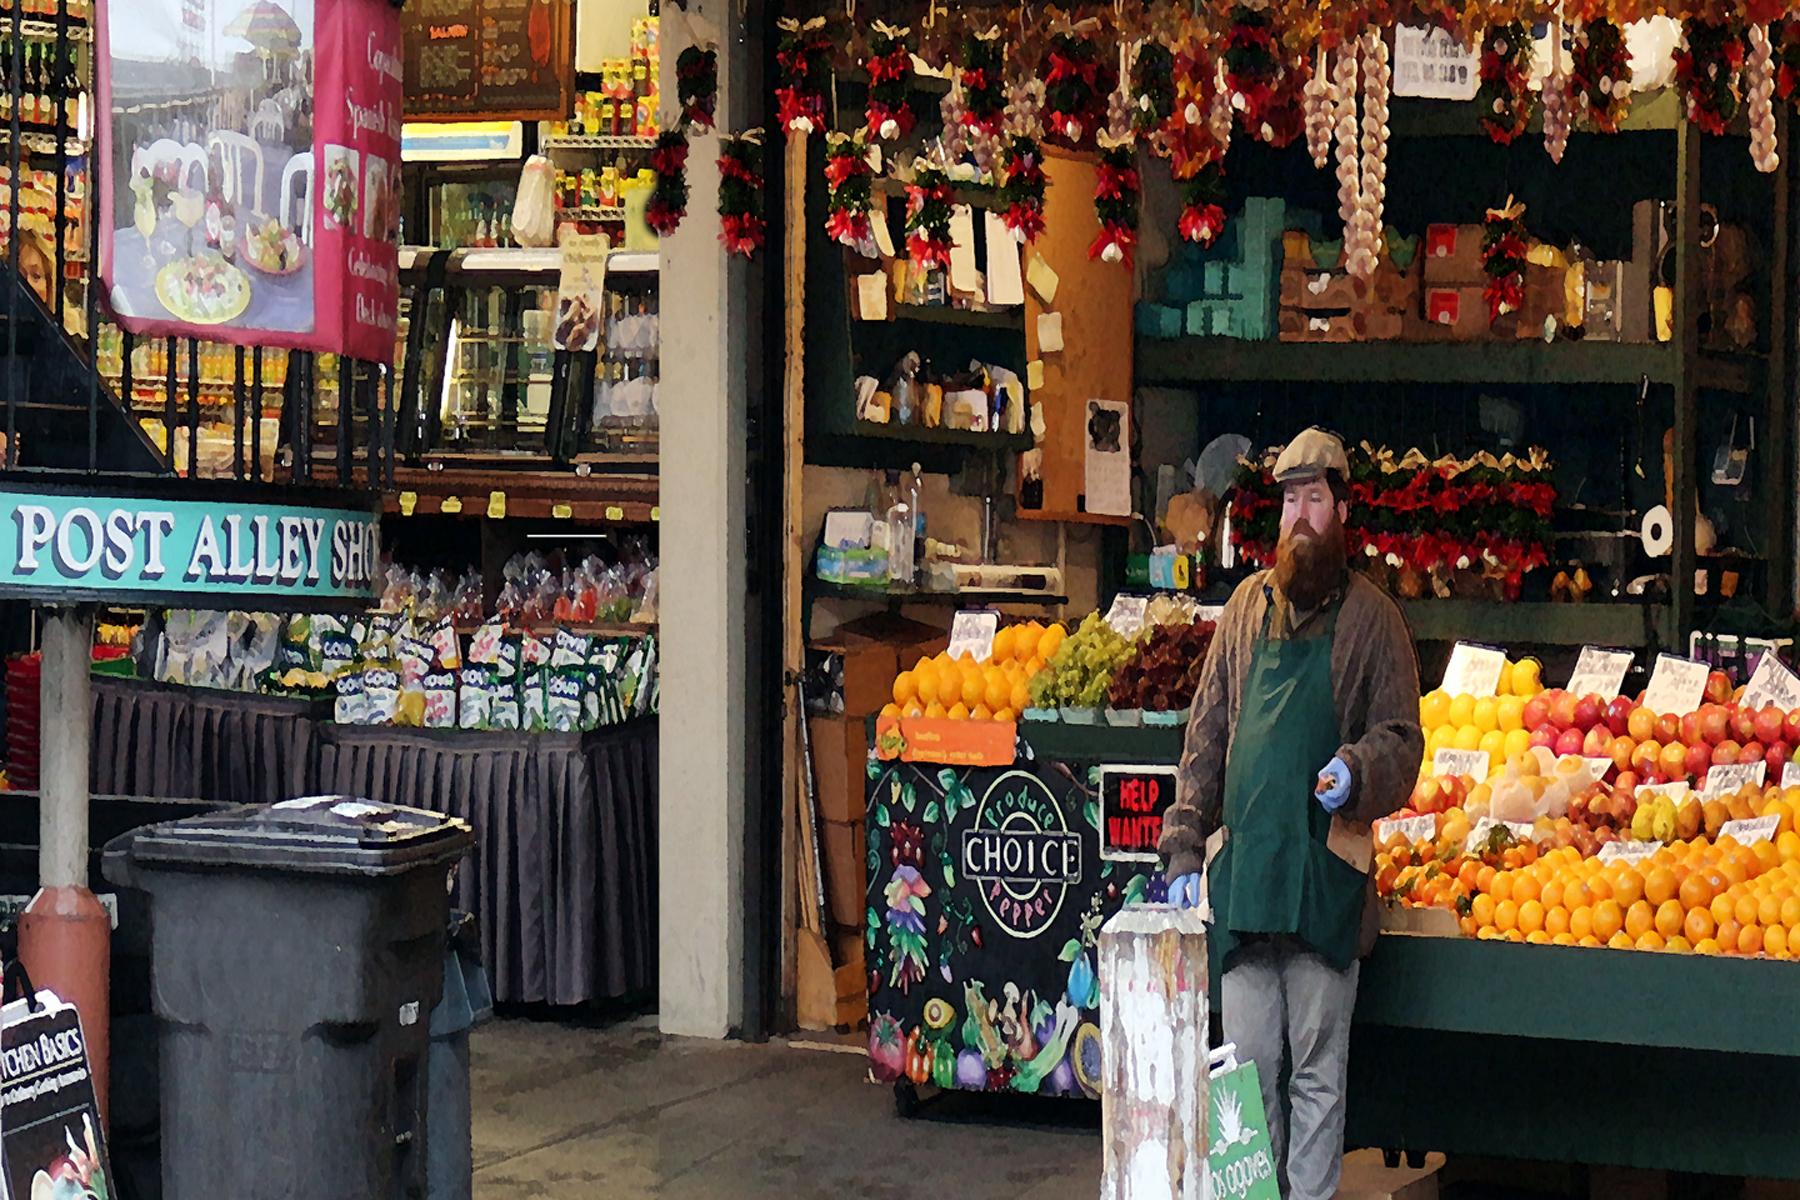 Post Alley Market